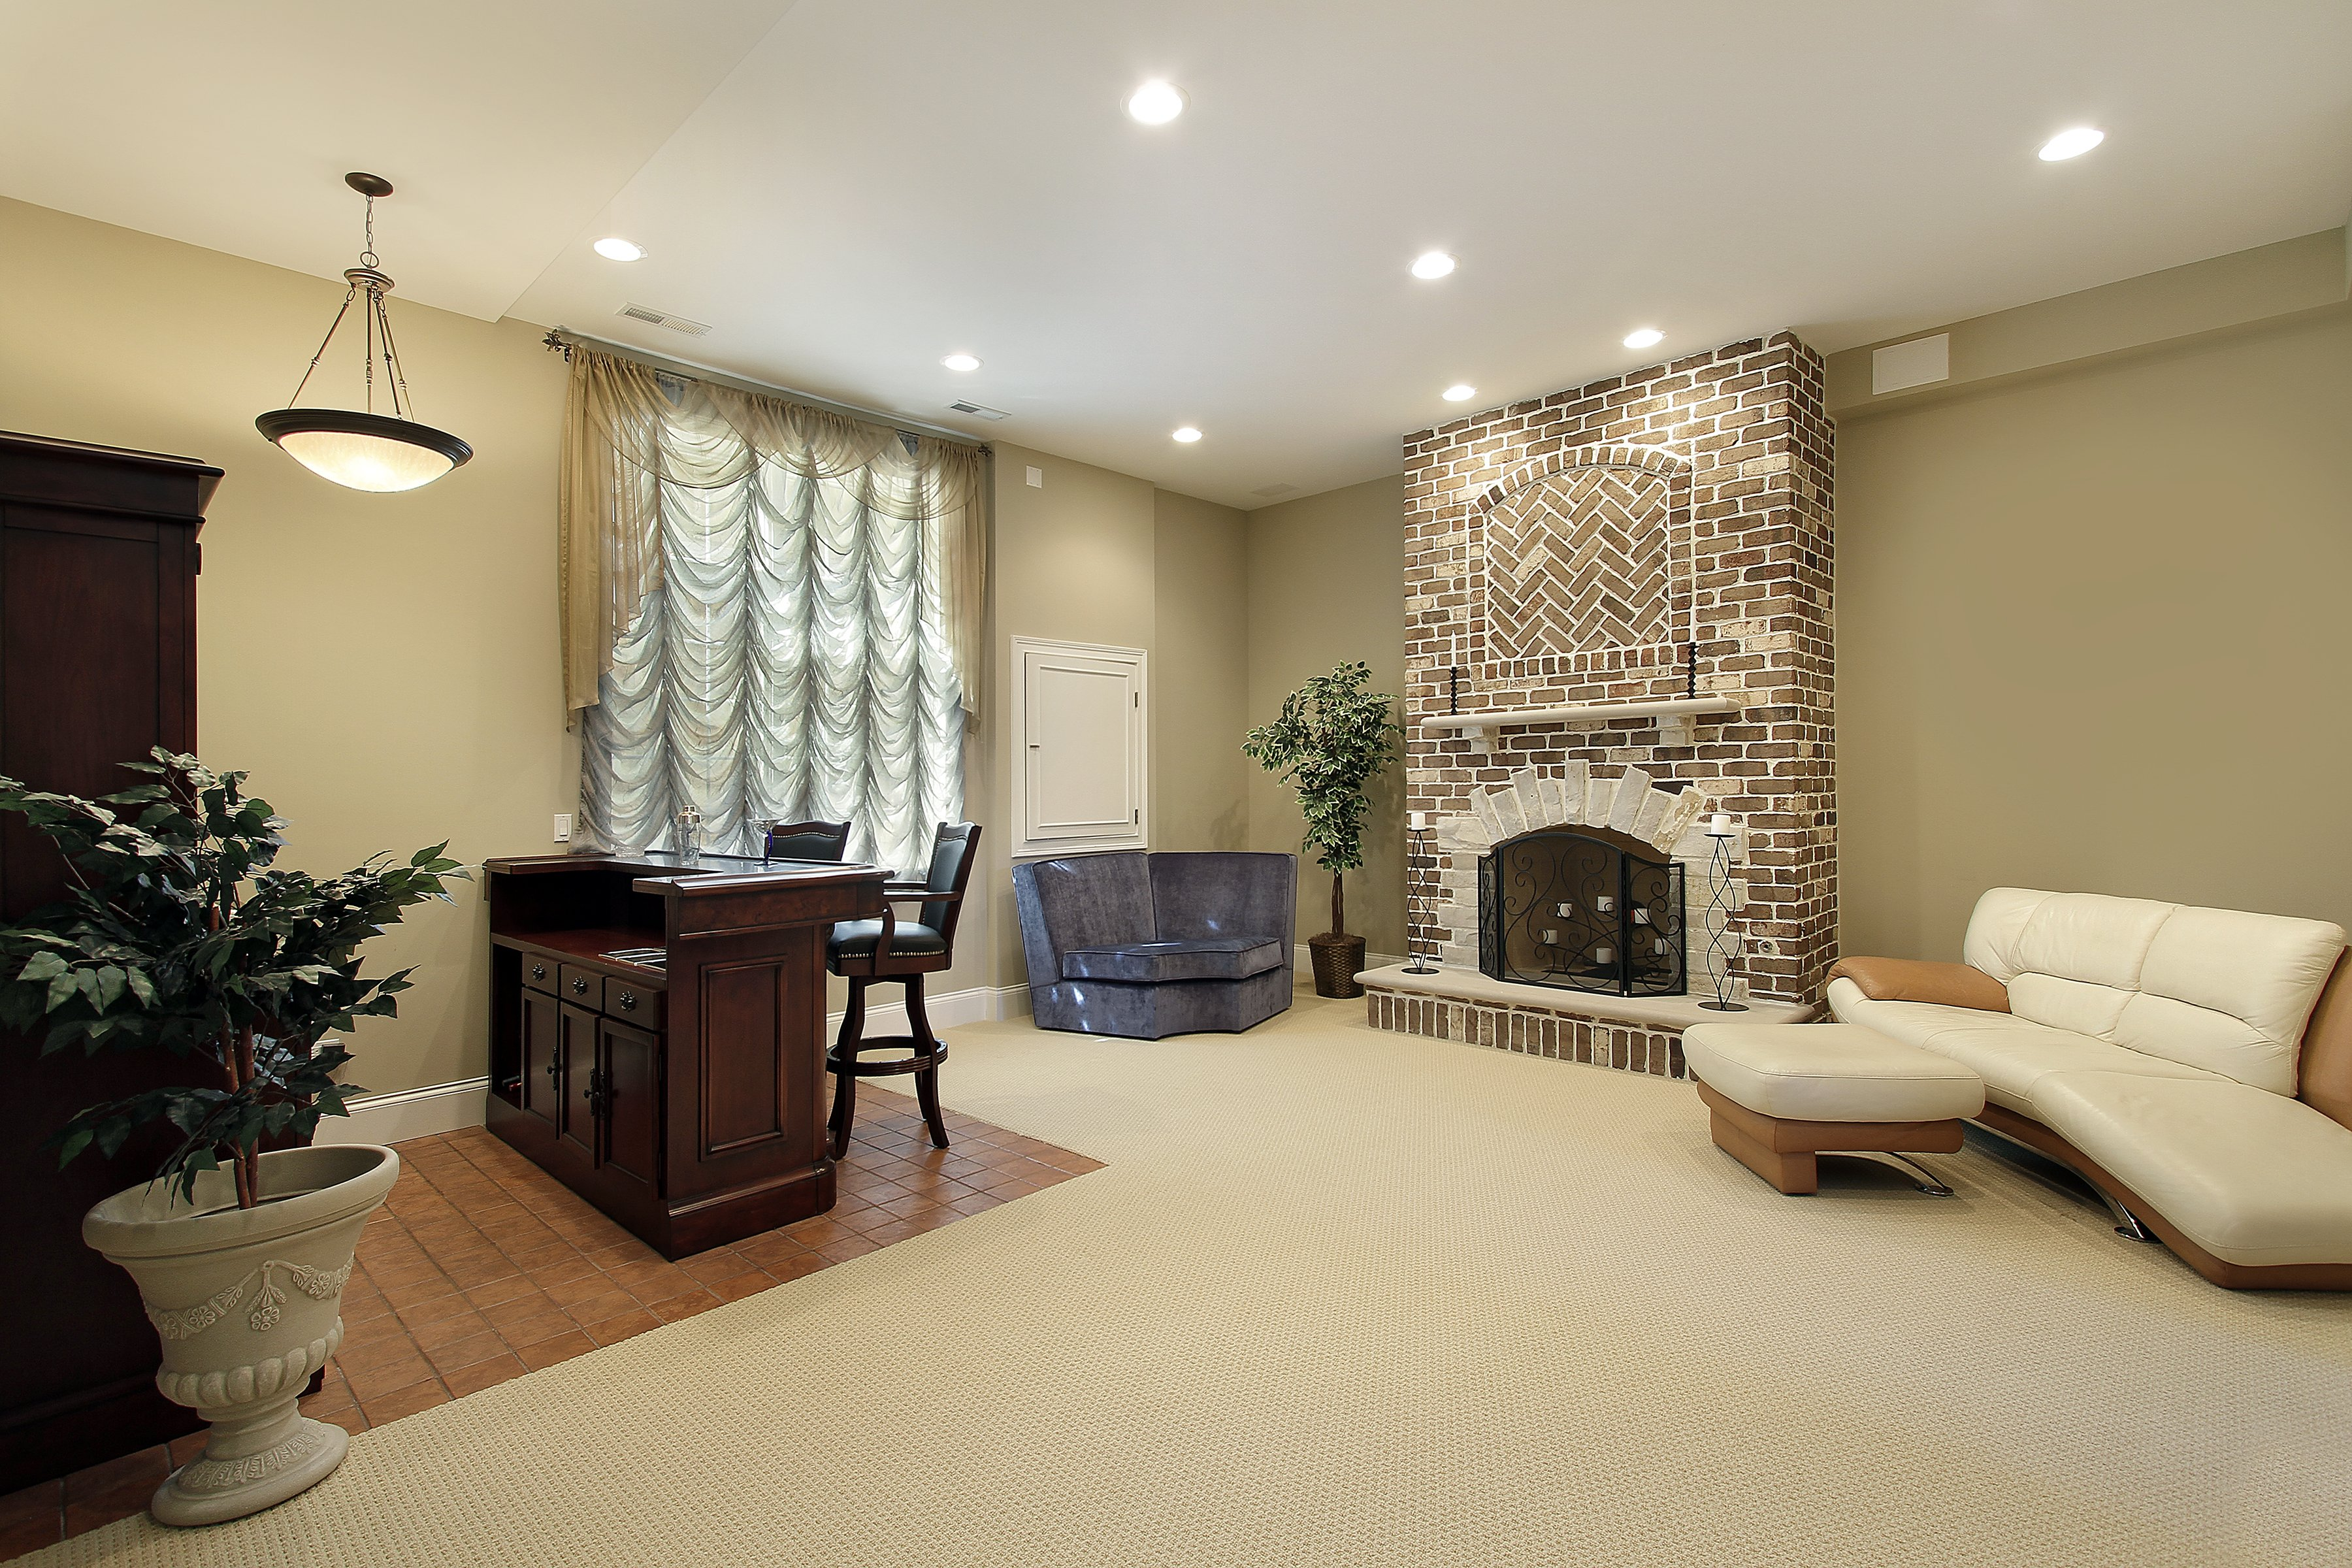 Basement Living Room with heated floors